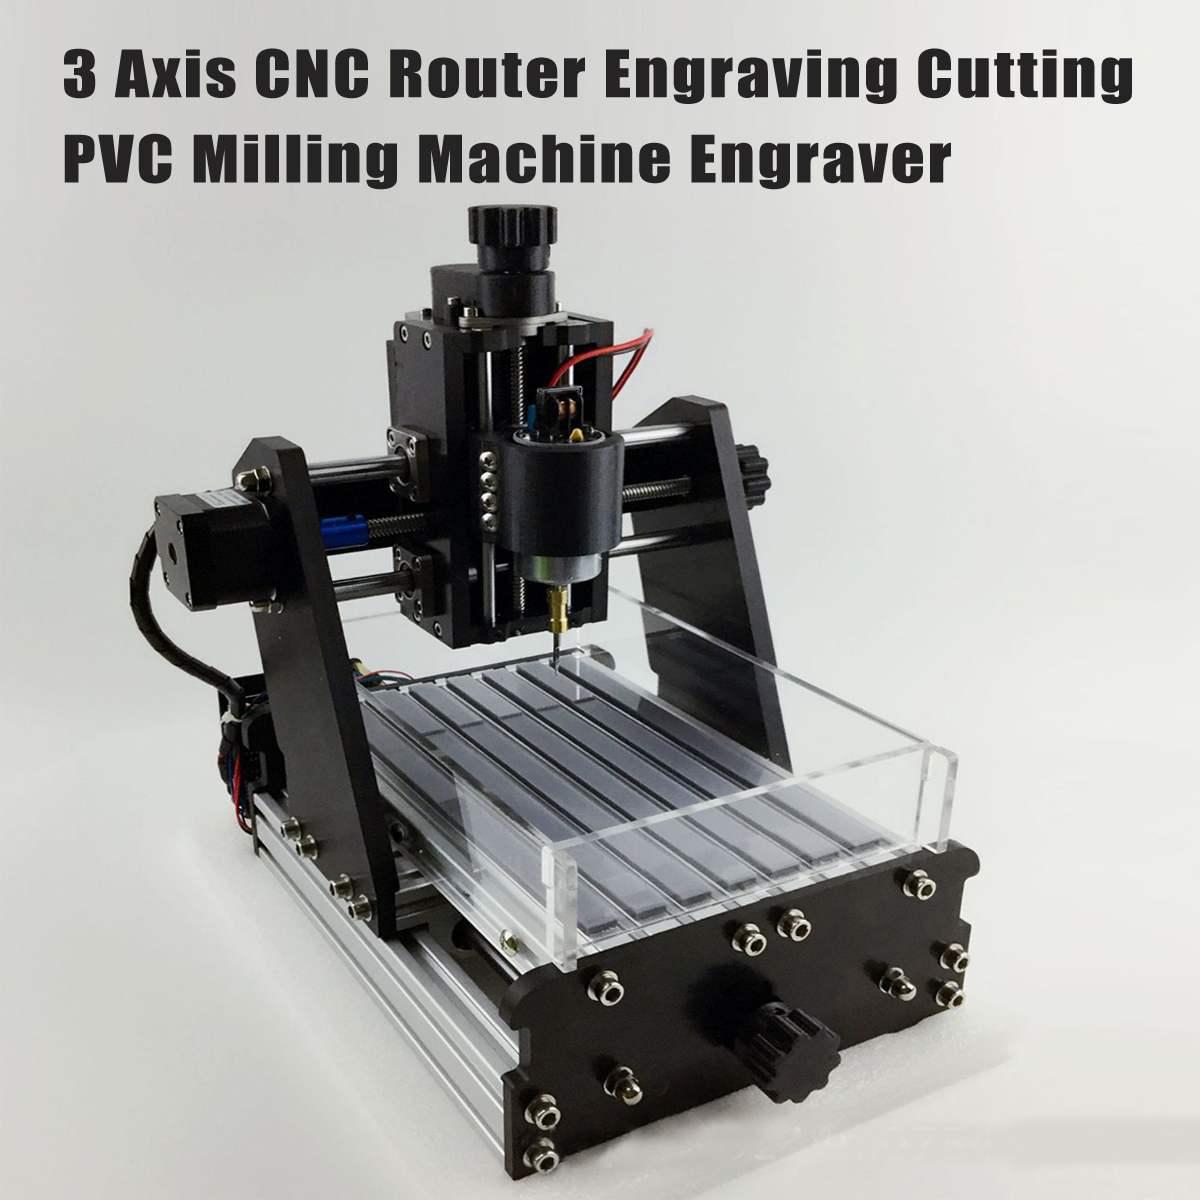 3 Axis CNC Router Engraving Cutting PVC Milling Machine Engraver + 500mW Laser  Mini Marking Machine Advanced Toys3 Axis CNC Router Engraving Cutting PVC Milling Machine Engraver + 500mW Laser  Mini Marking Machine Advanced Toys